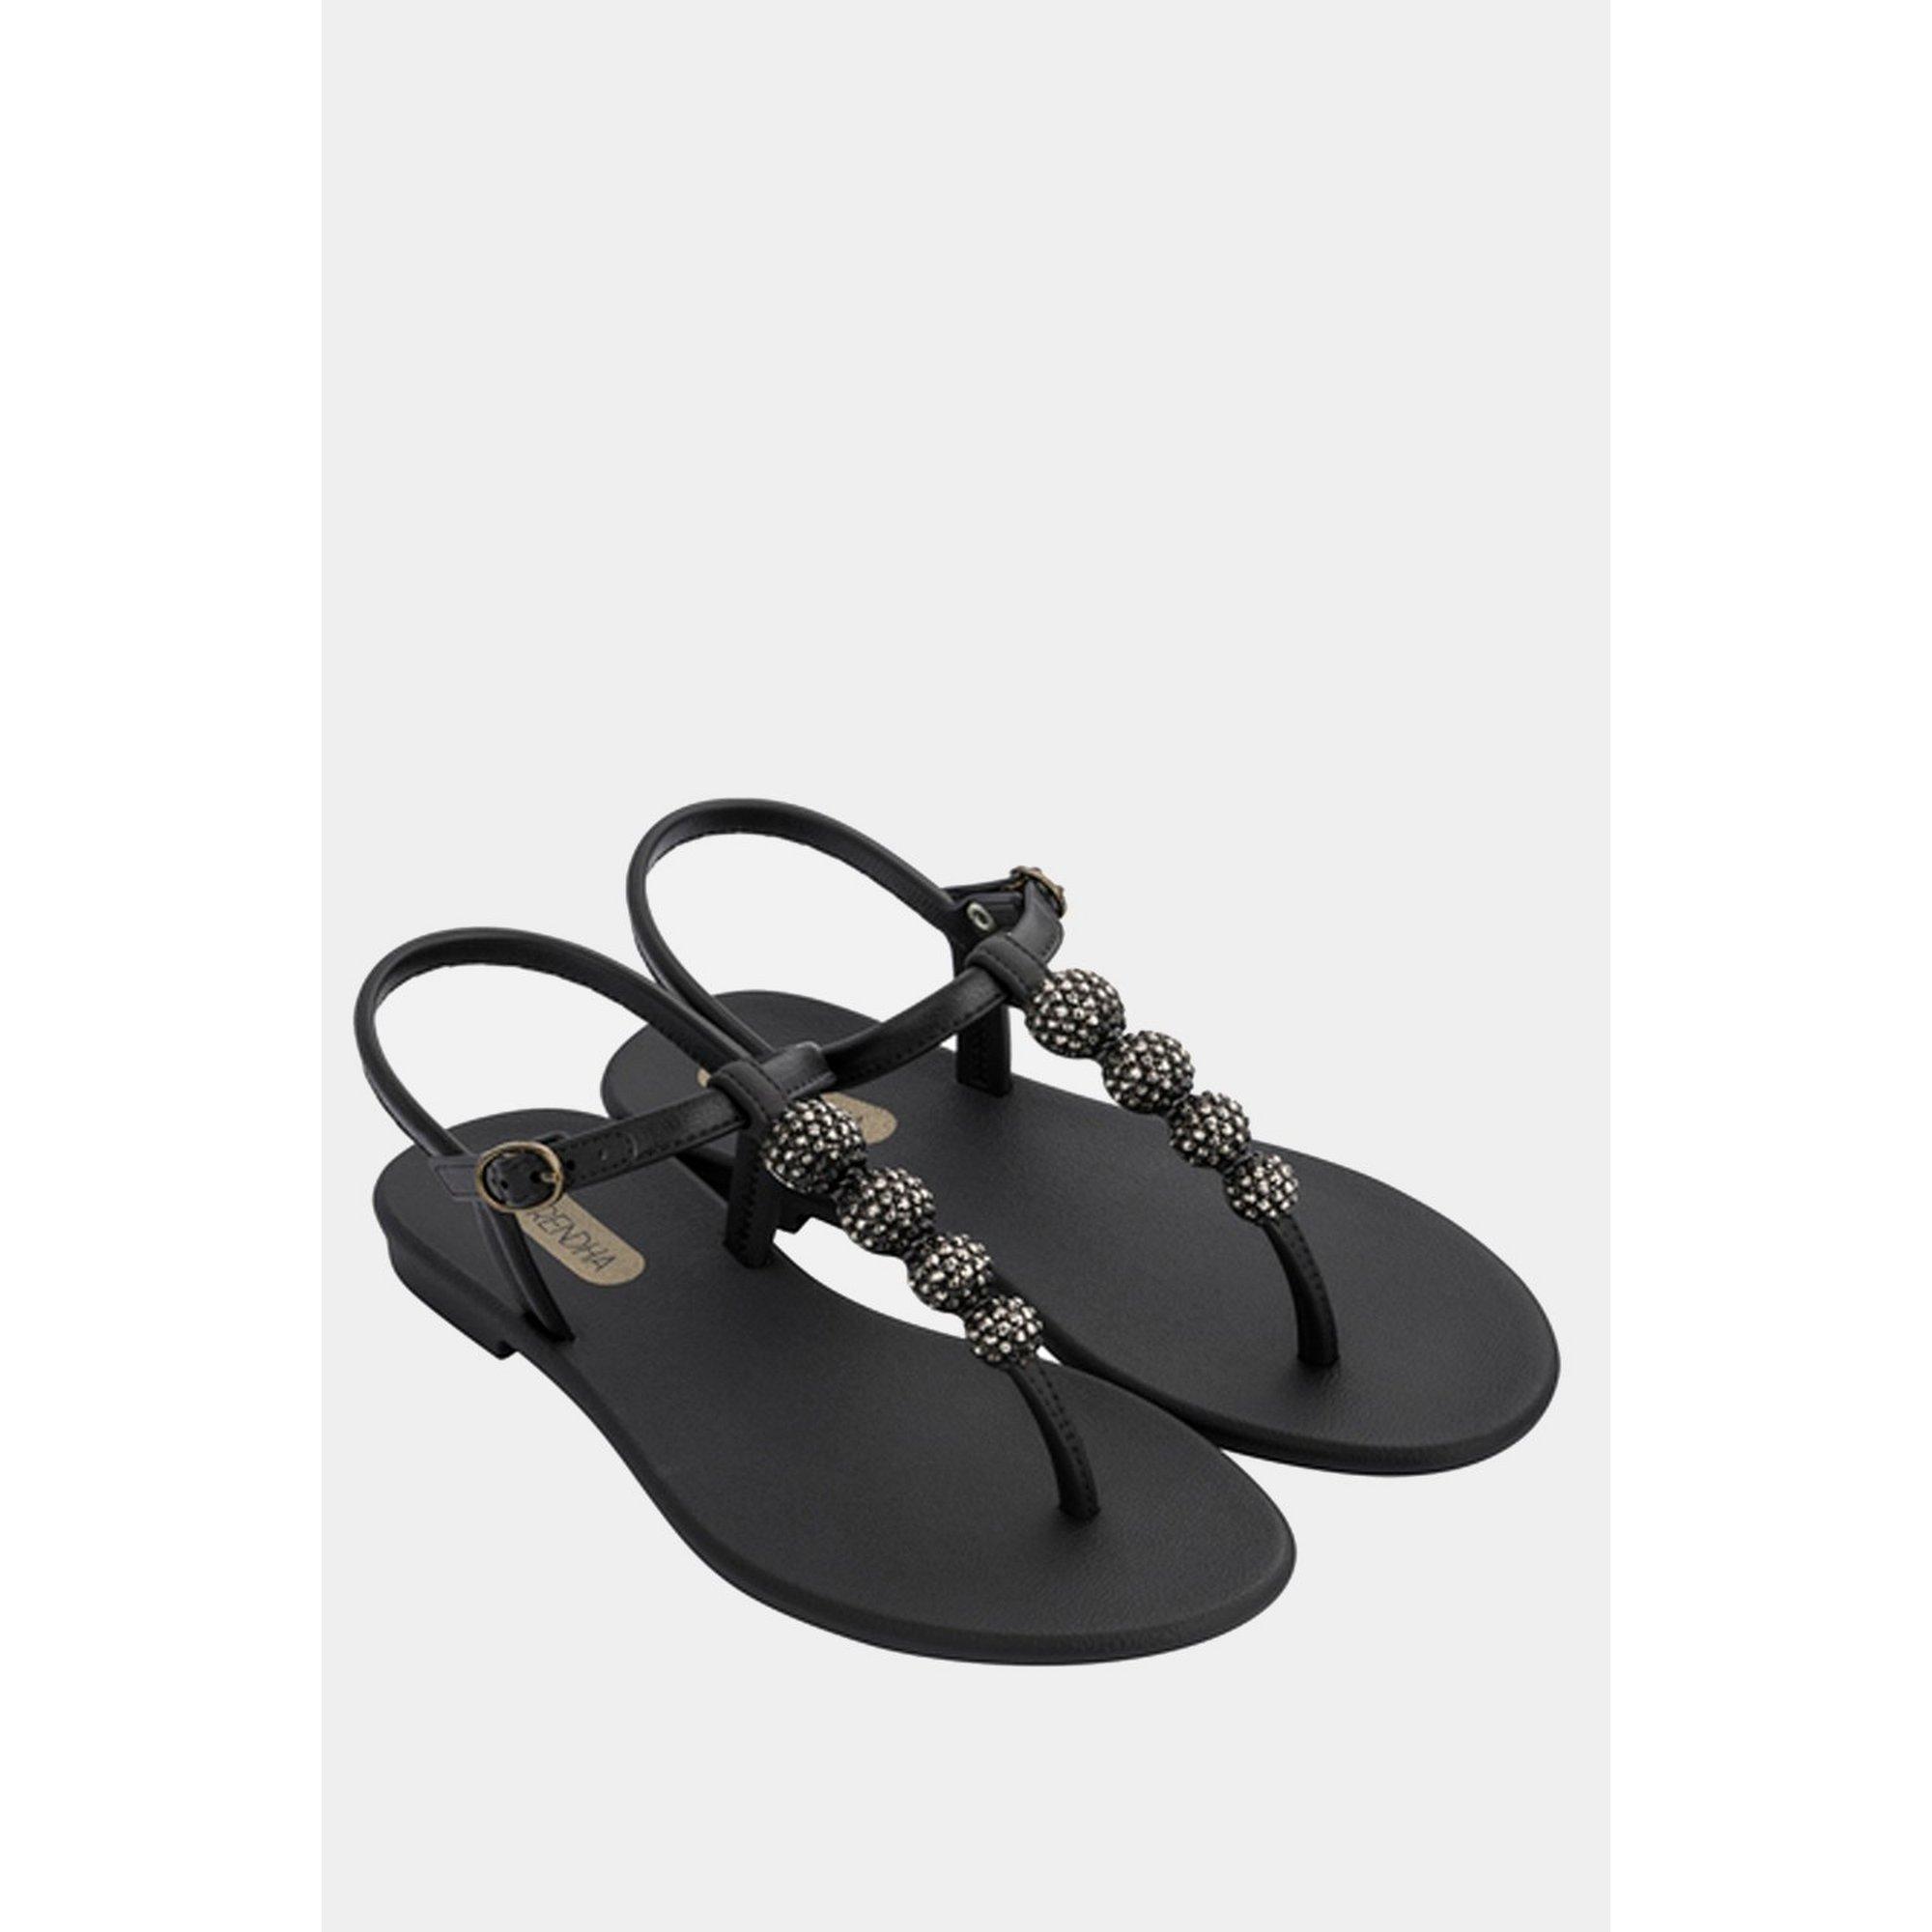 Image of Grendha Cacau Black Sandals